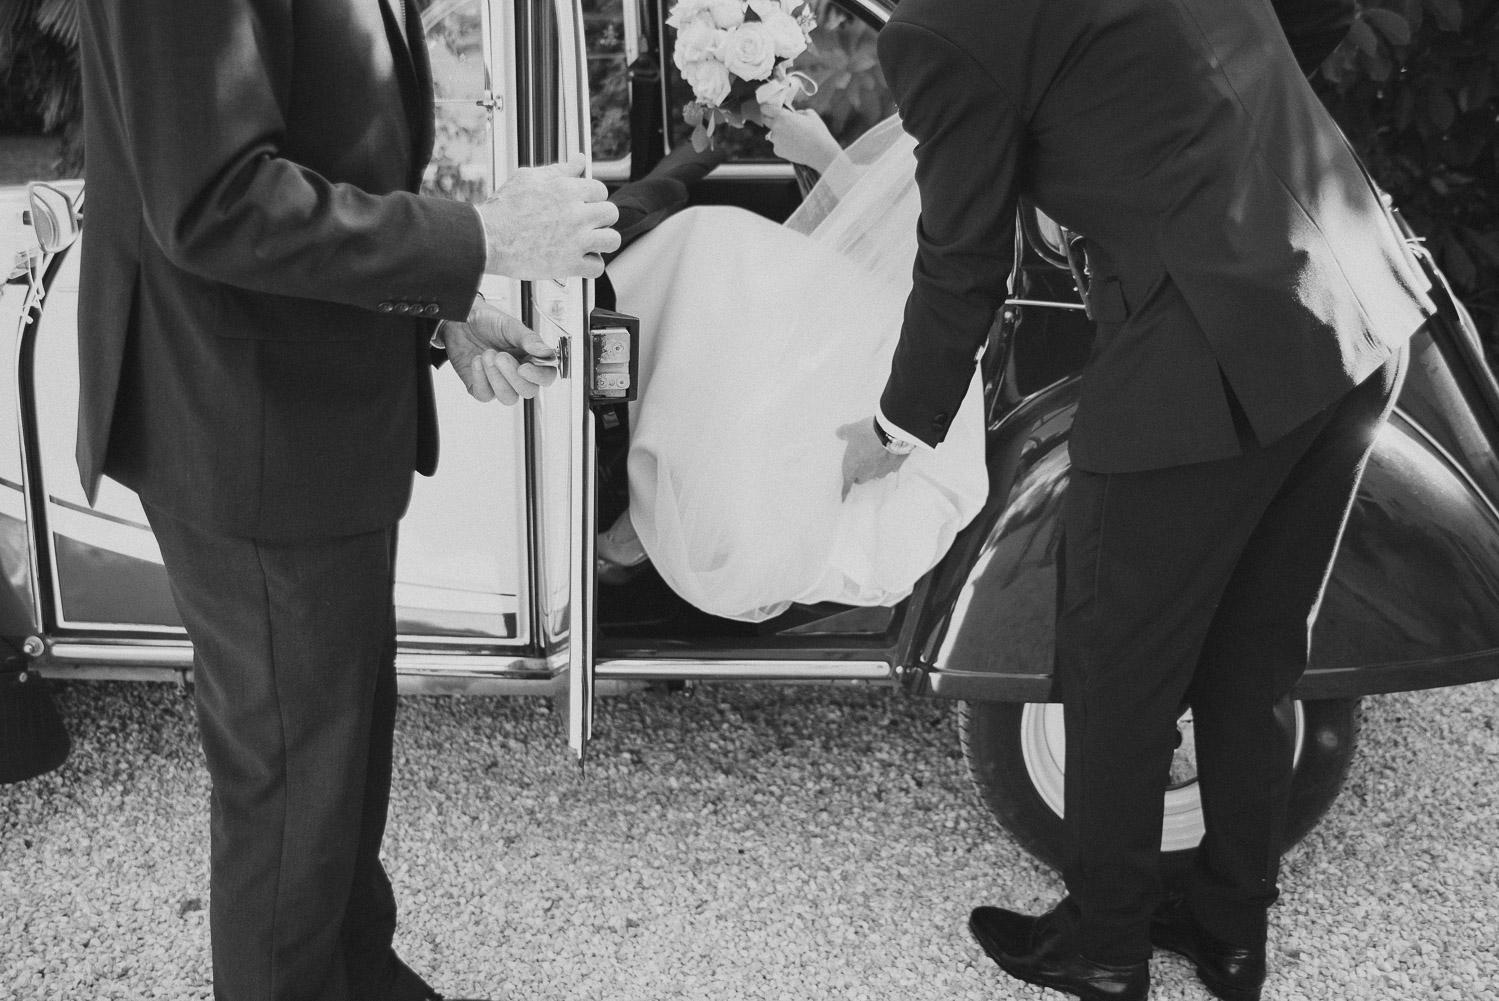 dordogne_eymet_wedding_france_katy_webb_photography_france_UK68